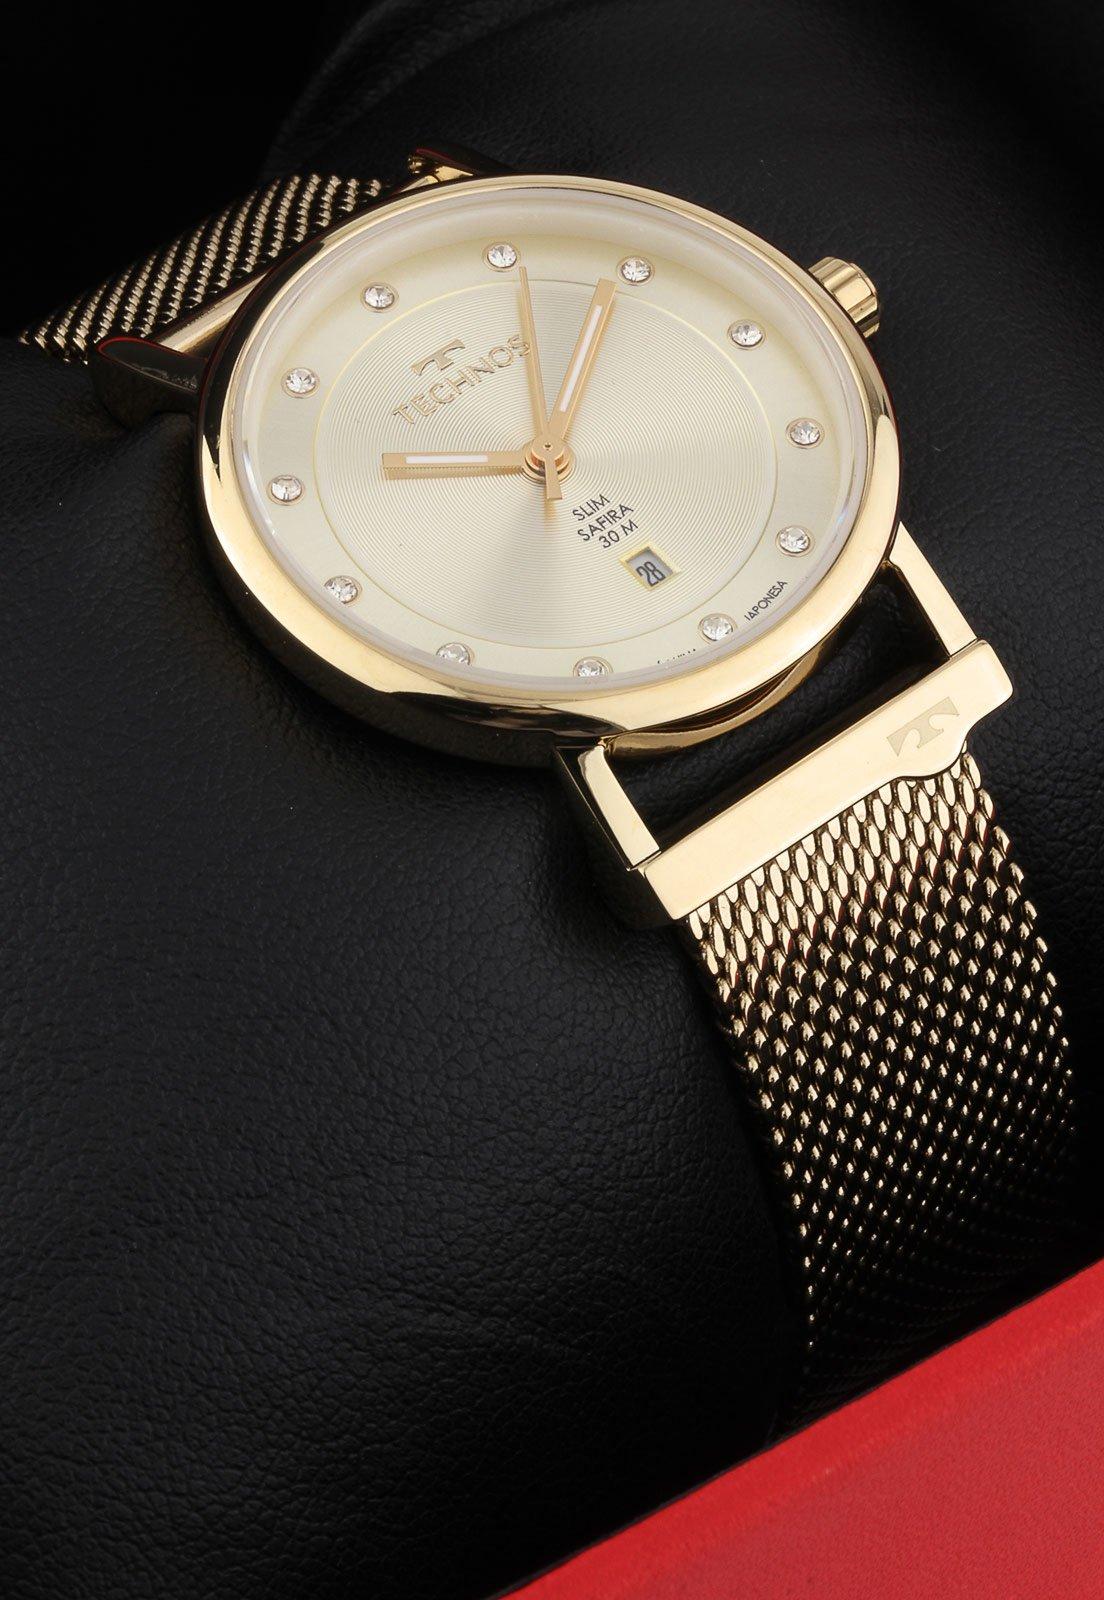 Relógio Technos 9T13AB/4X Dourado - Marca Technos